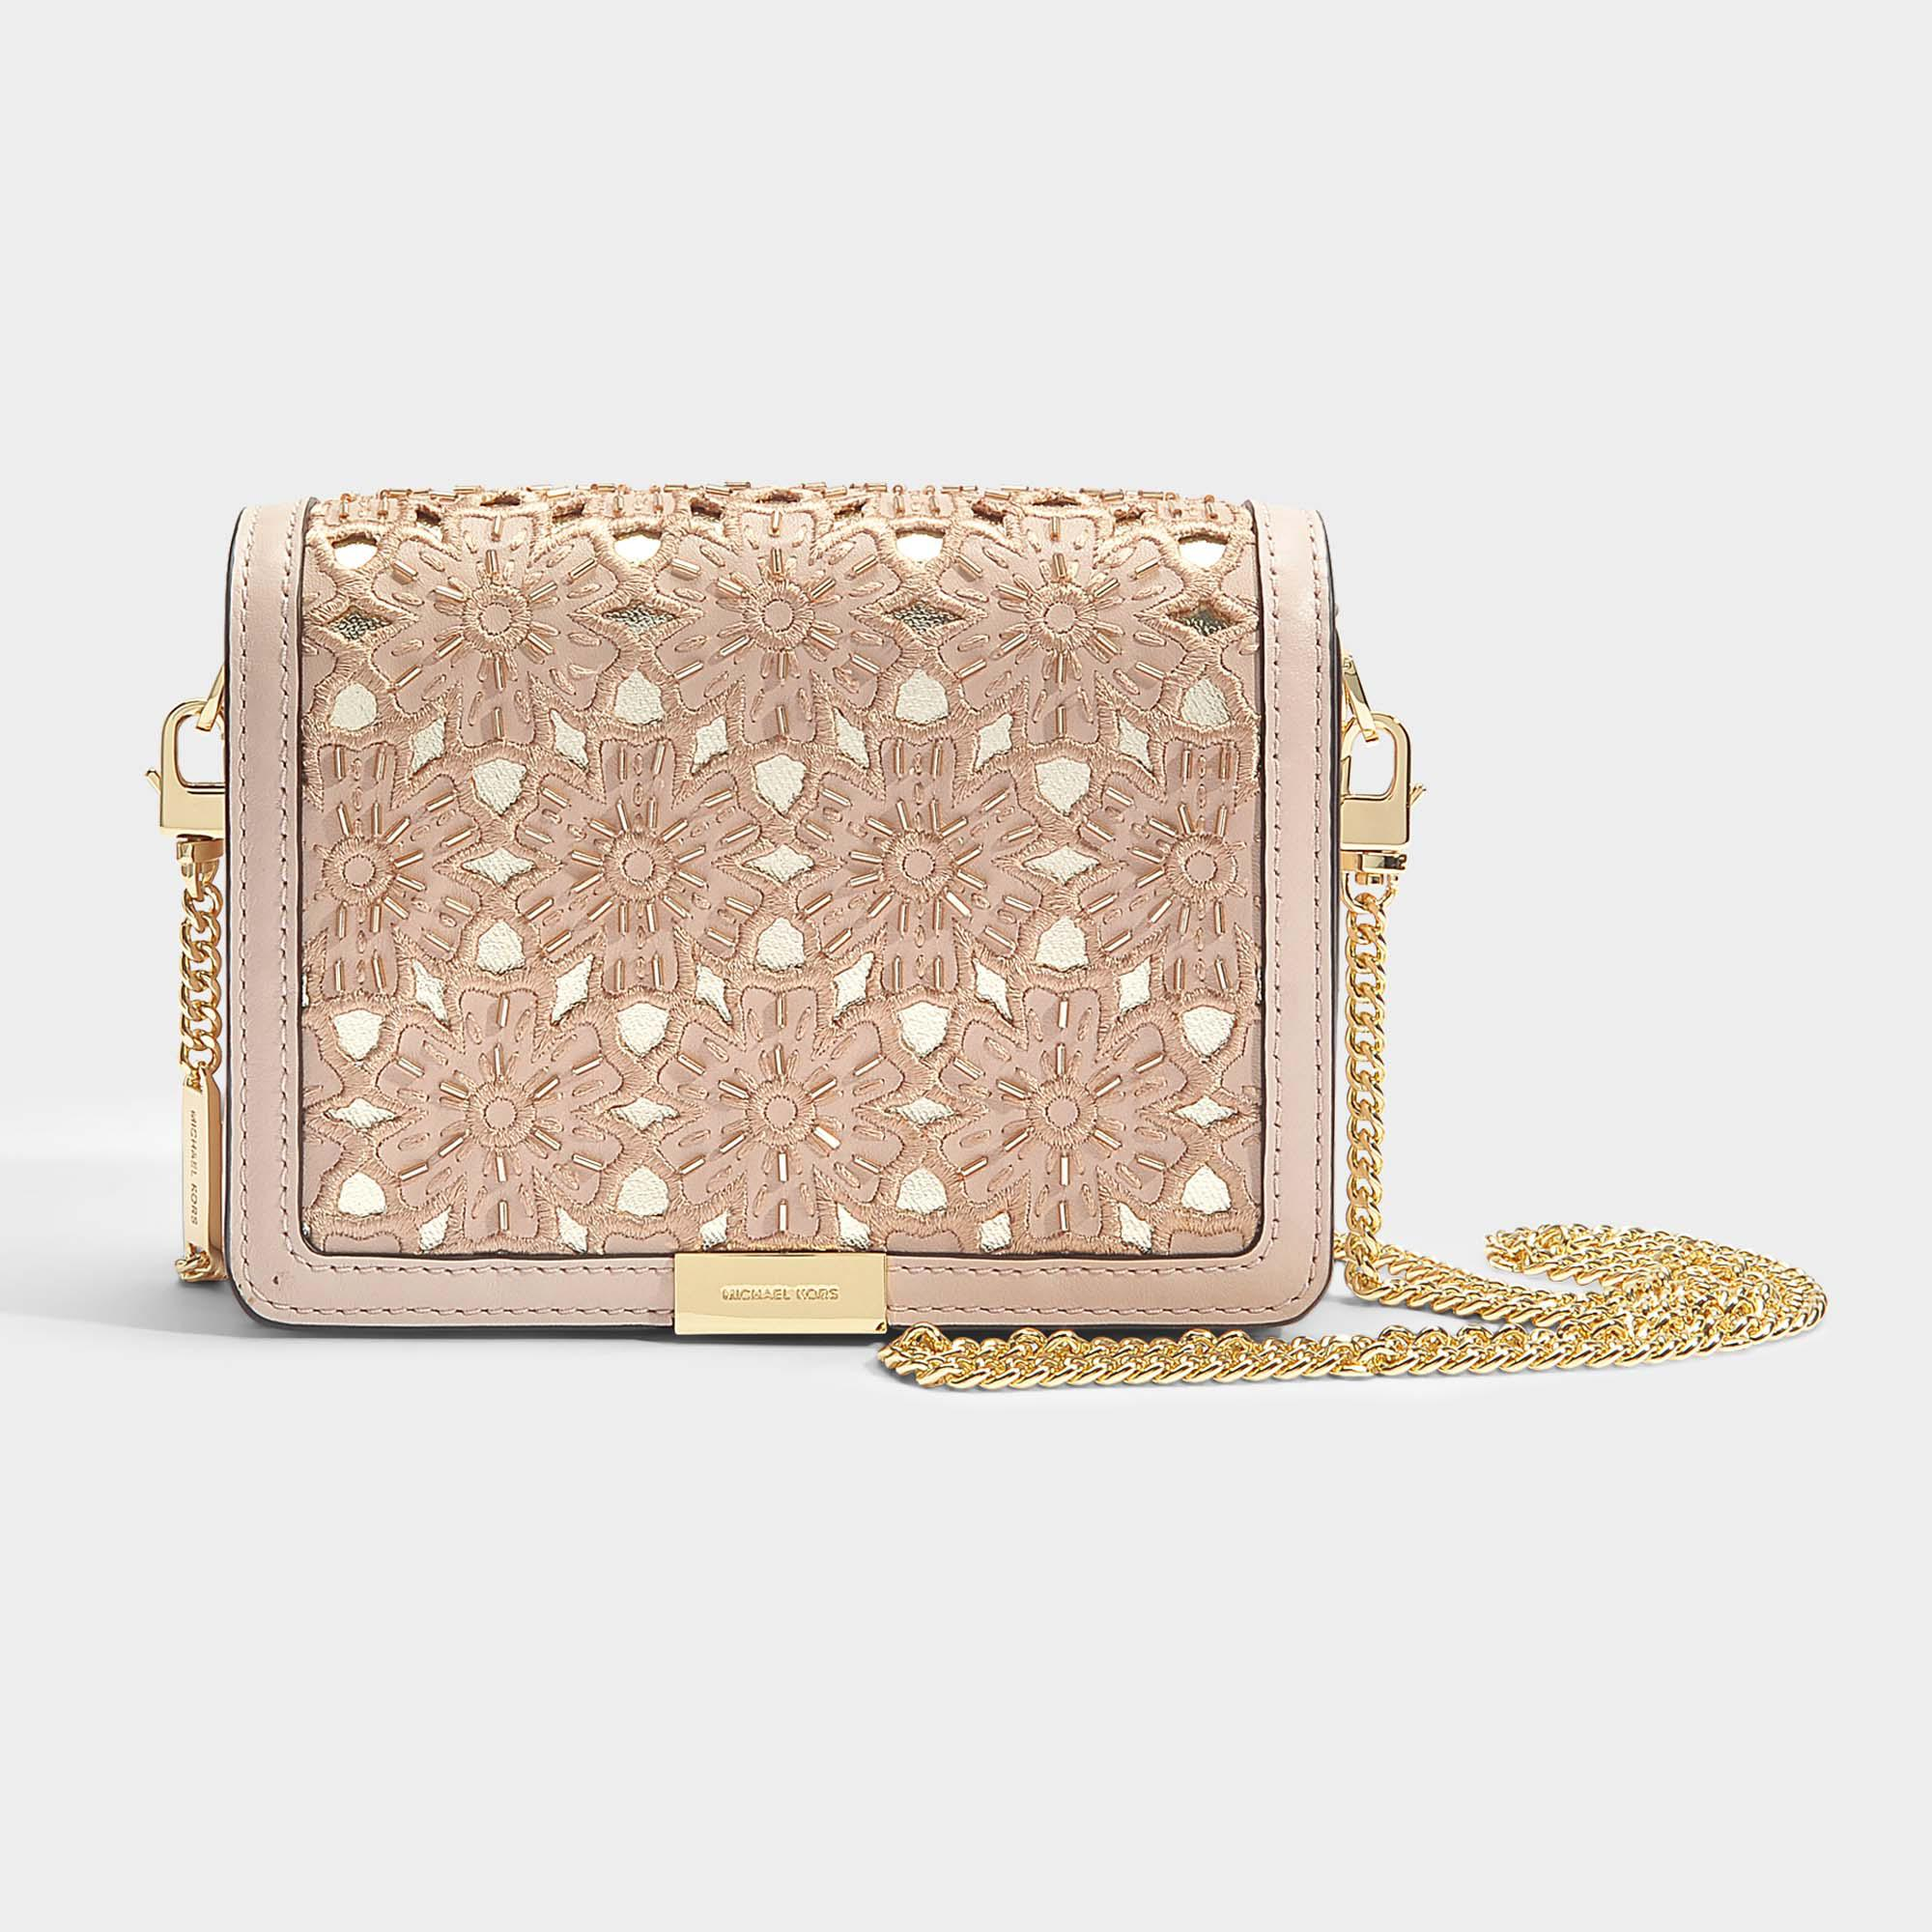 7437c88f85aa MICHAEL Michael Kors Jade Medium Gusset Clutch In Soft Pink Flower ...